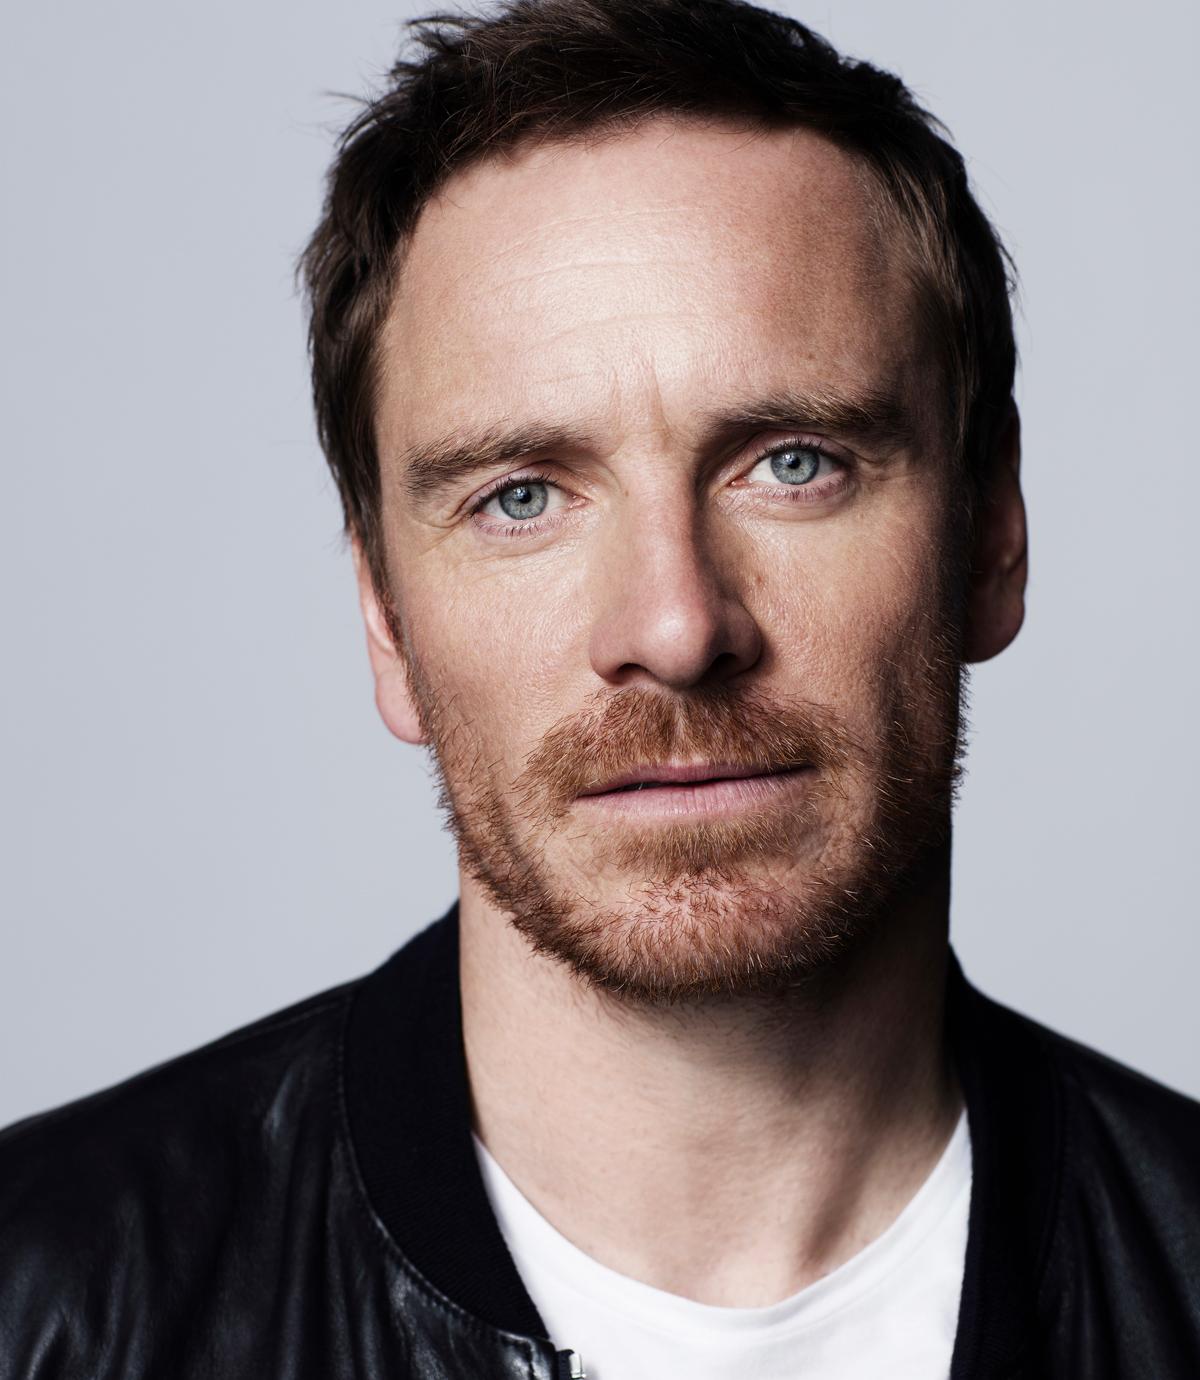 MichaelFassbender 20 Actors Who Would Kill It As The Next James Bond